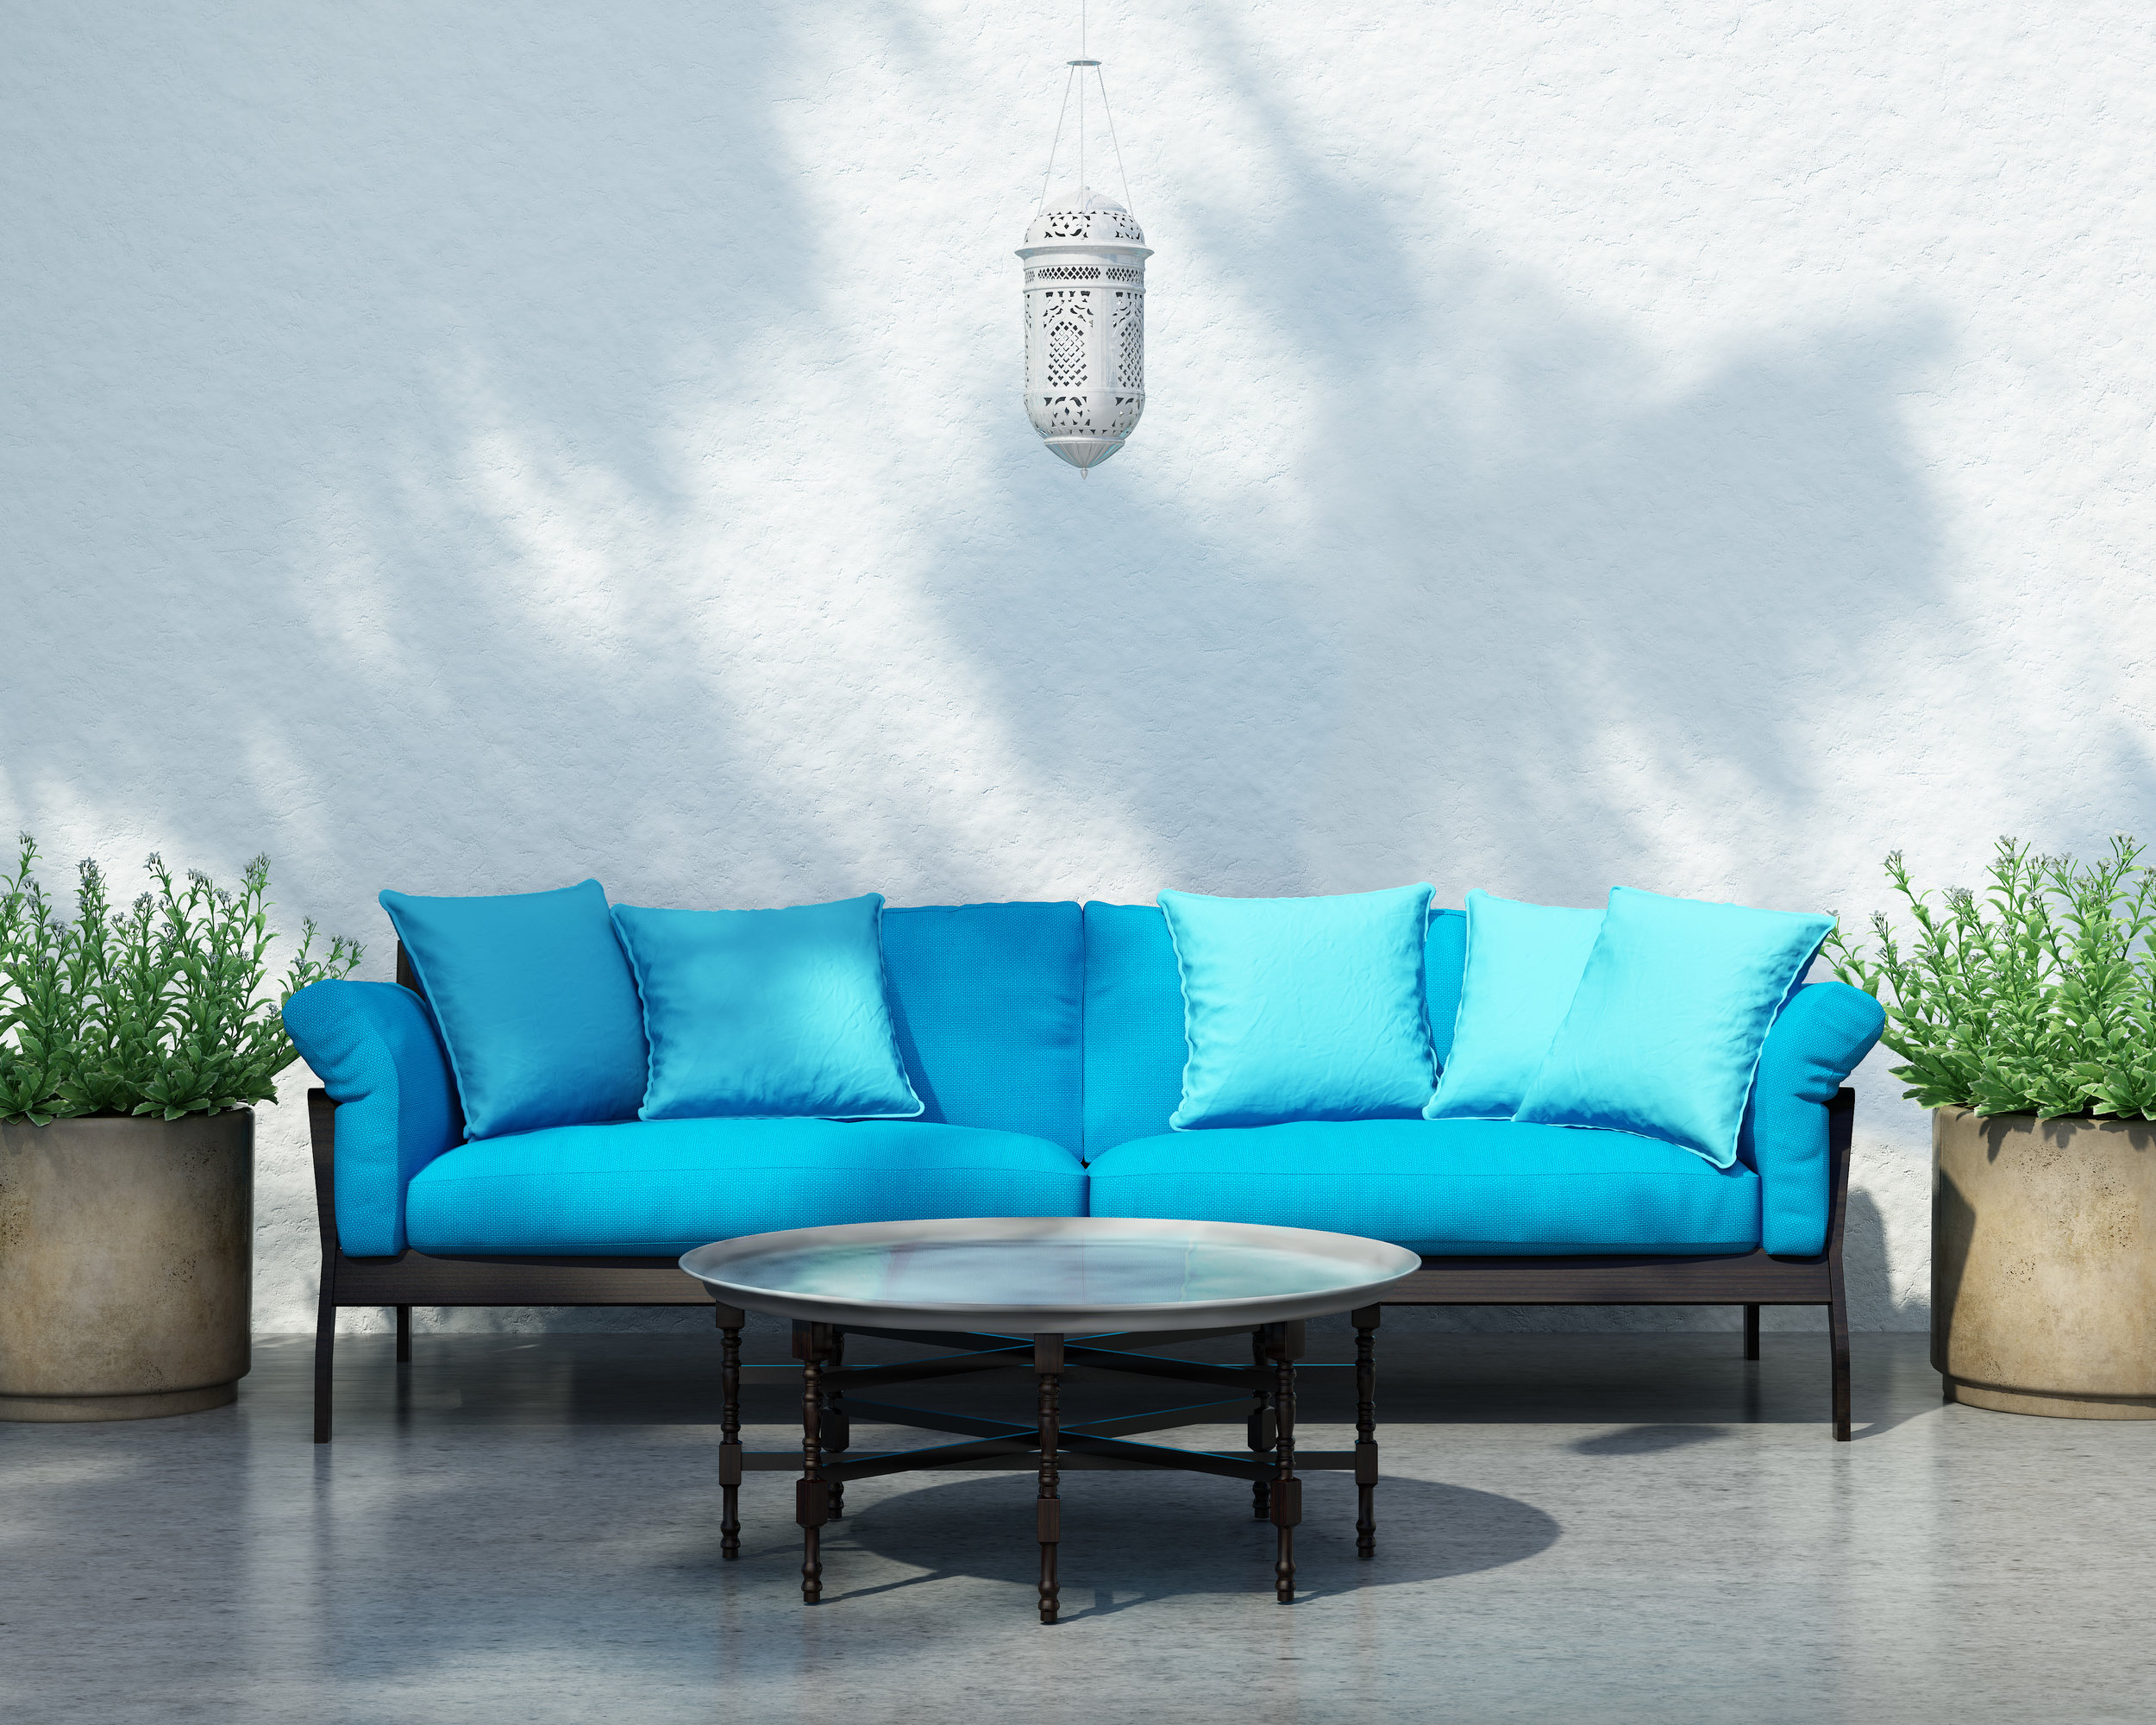 outdoor furniture (2).jpeg